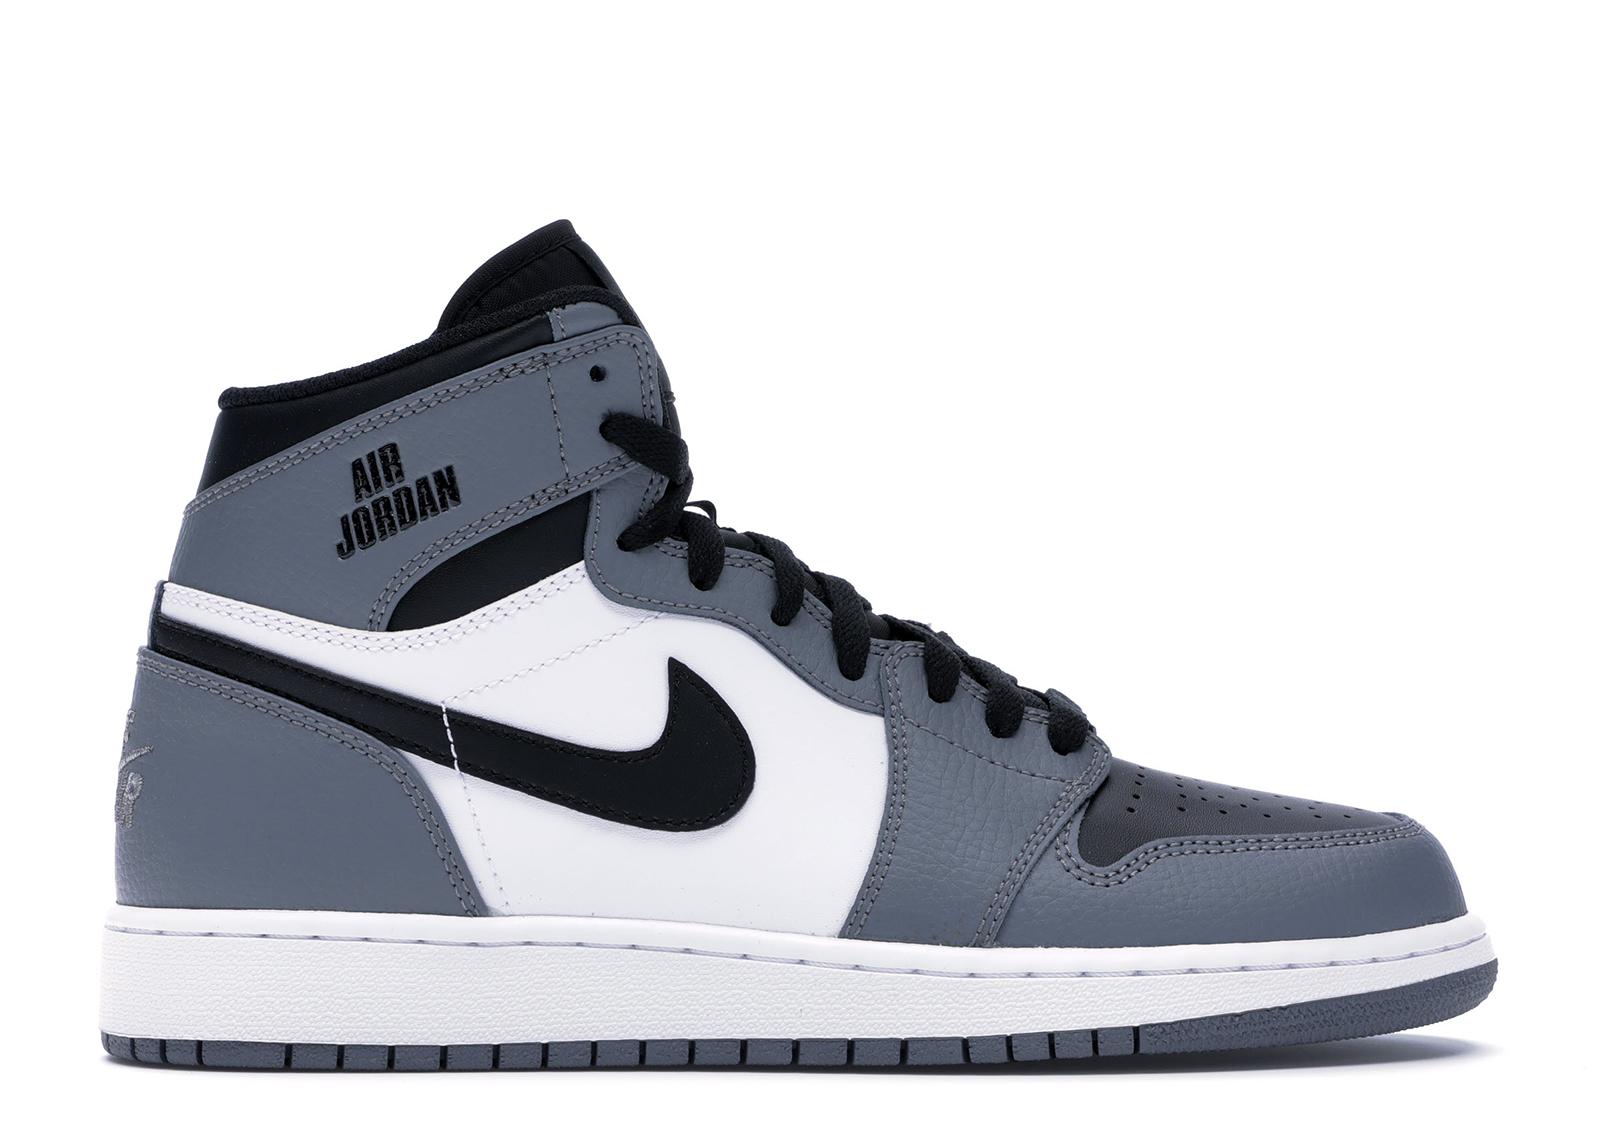 Jordan 1 Retro High Rare Air Cool Grey